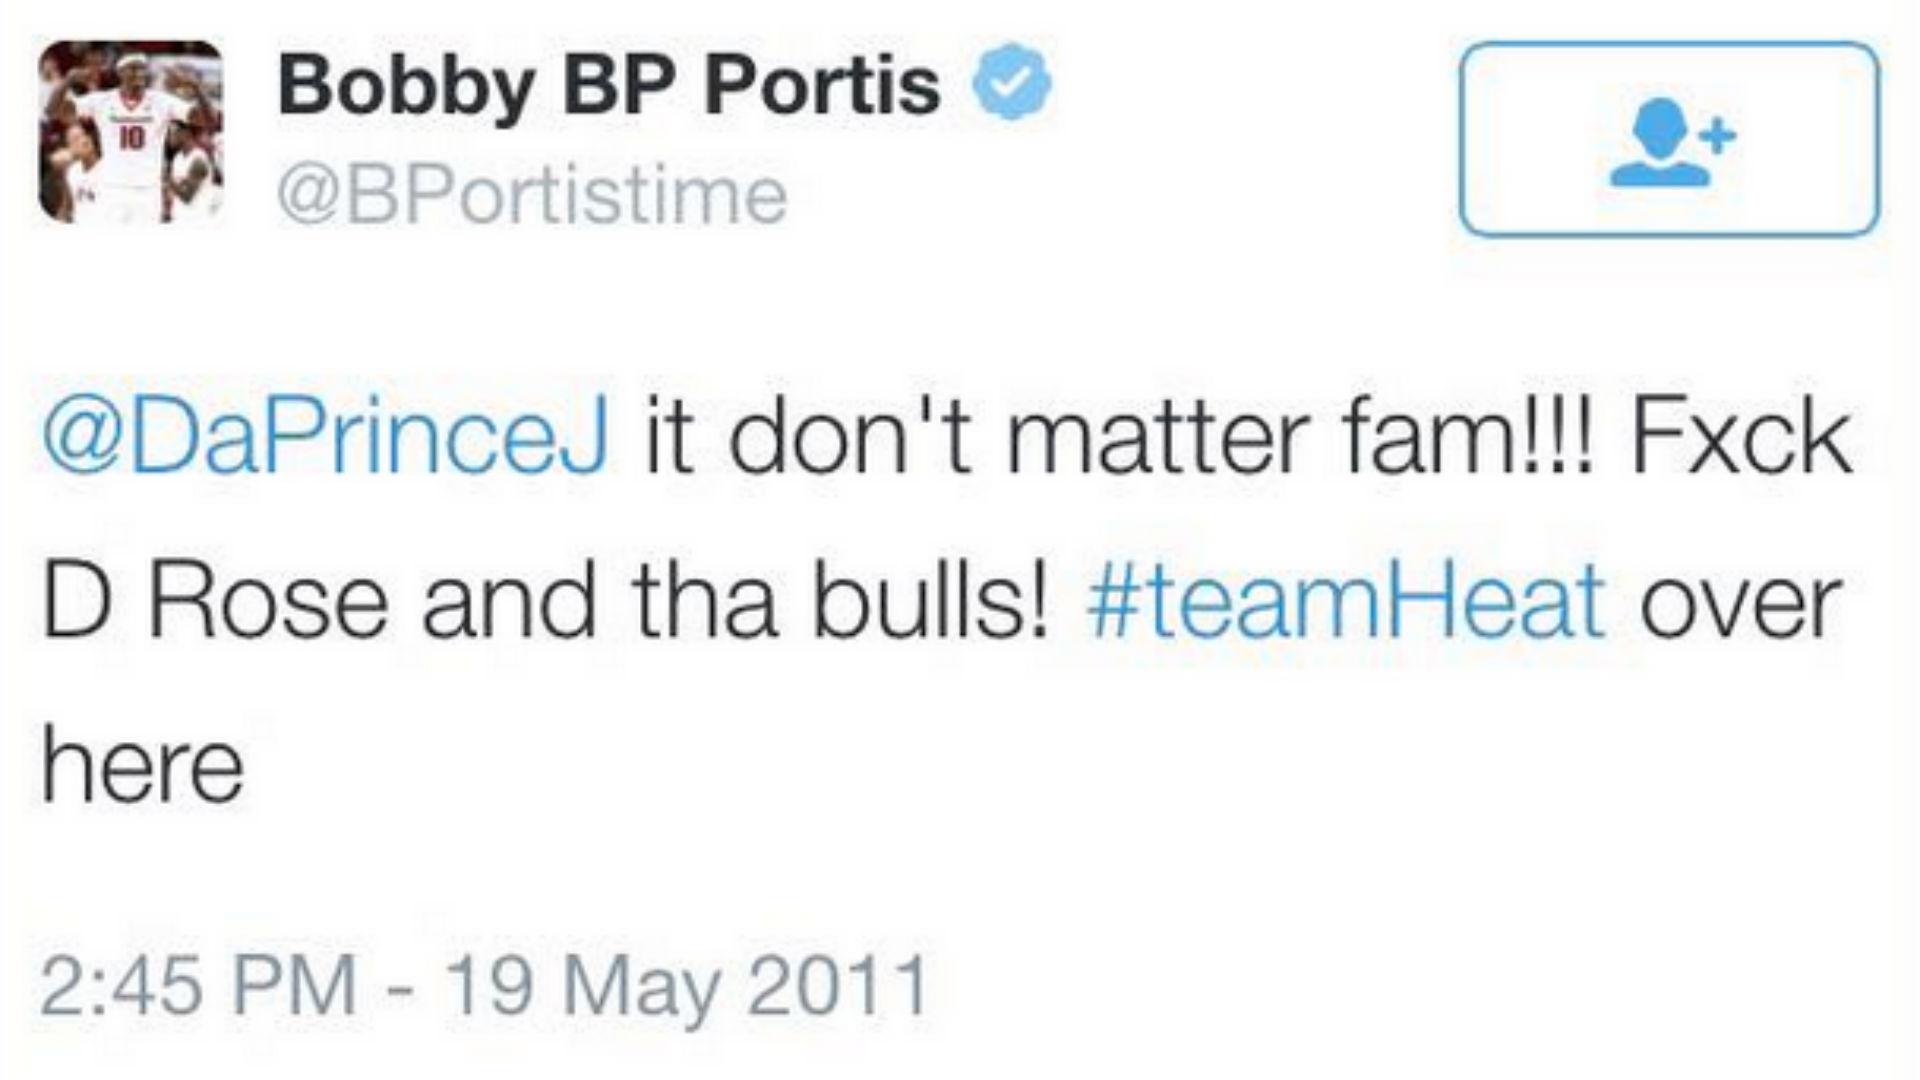 bobby-portis-tweets